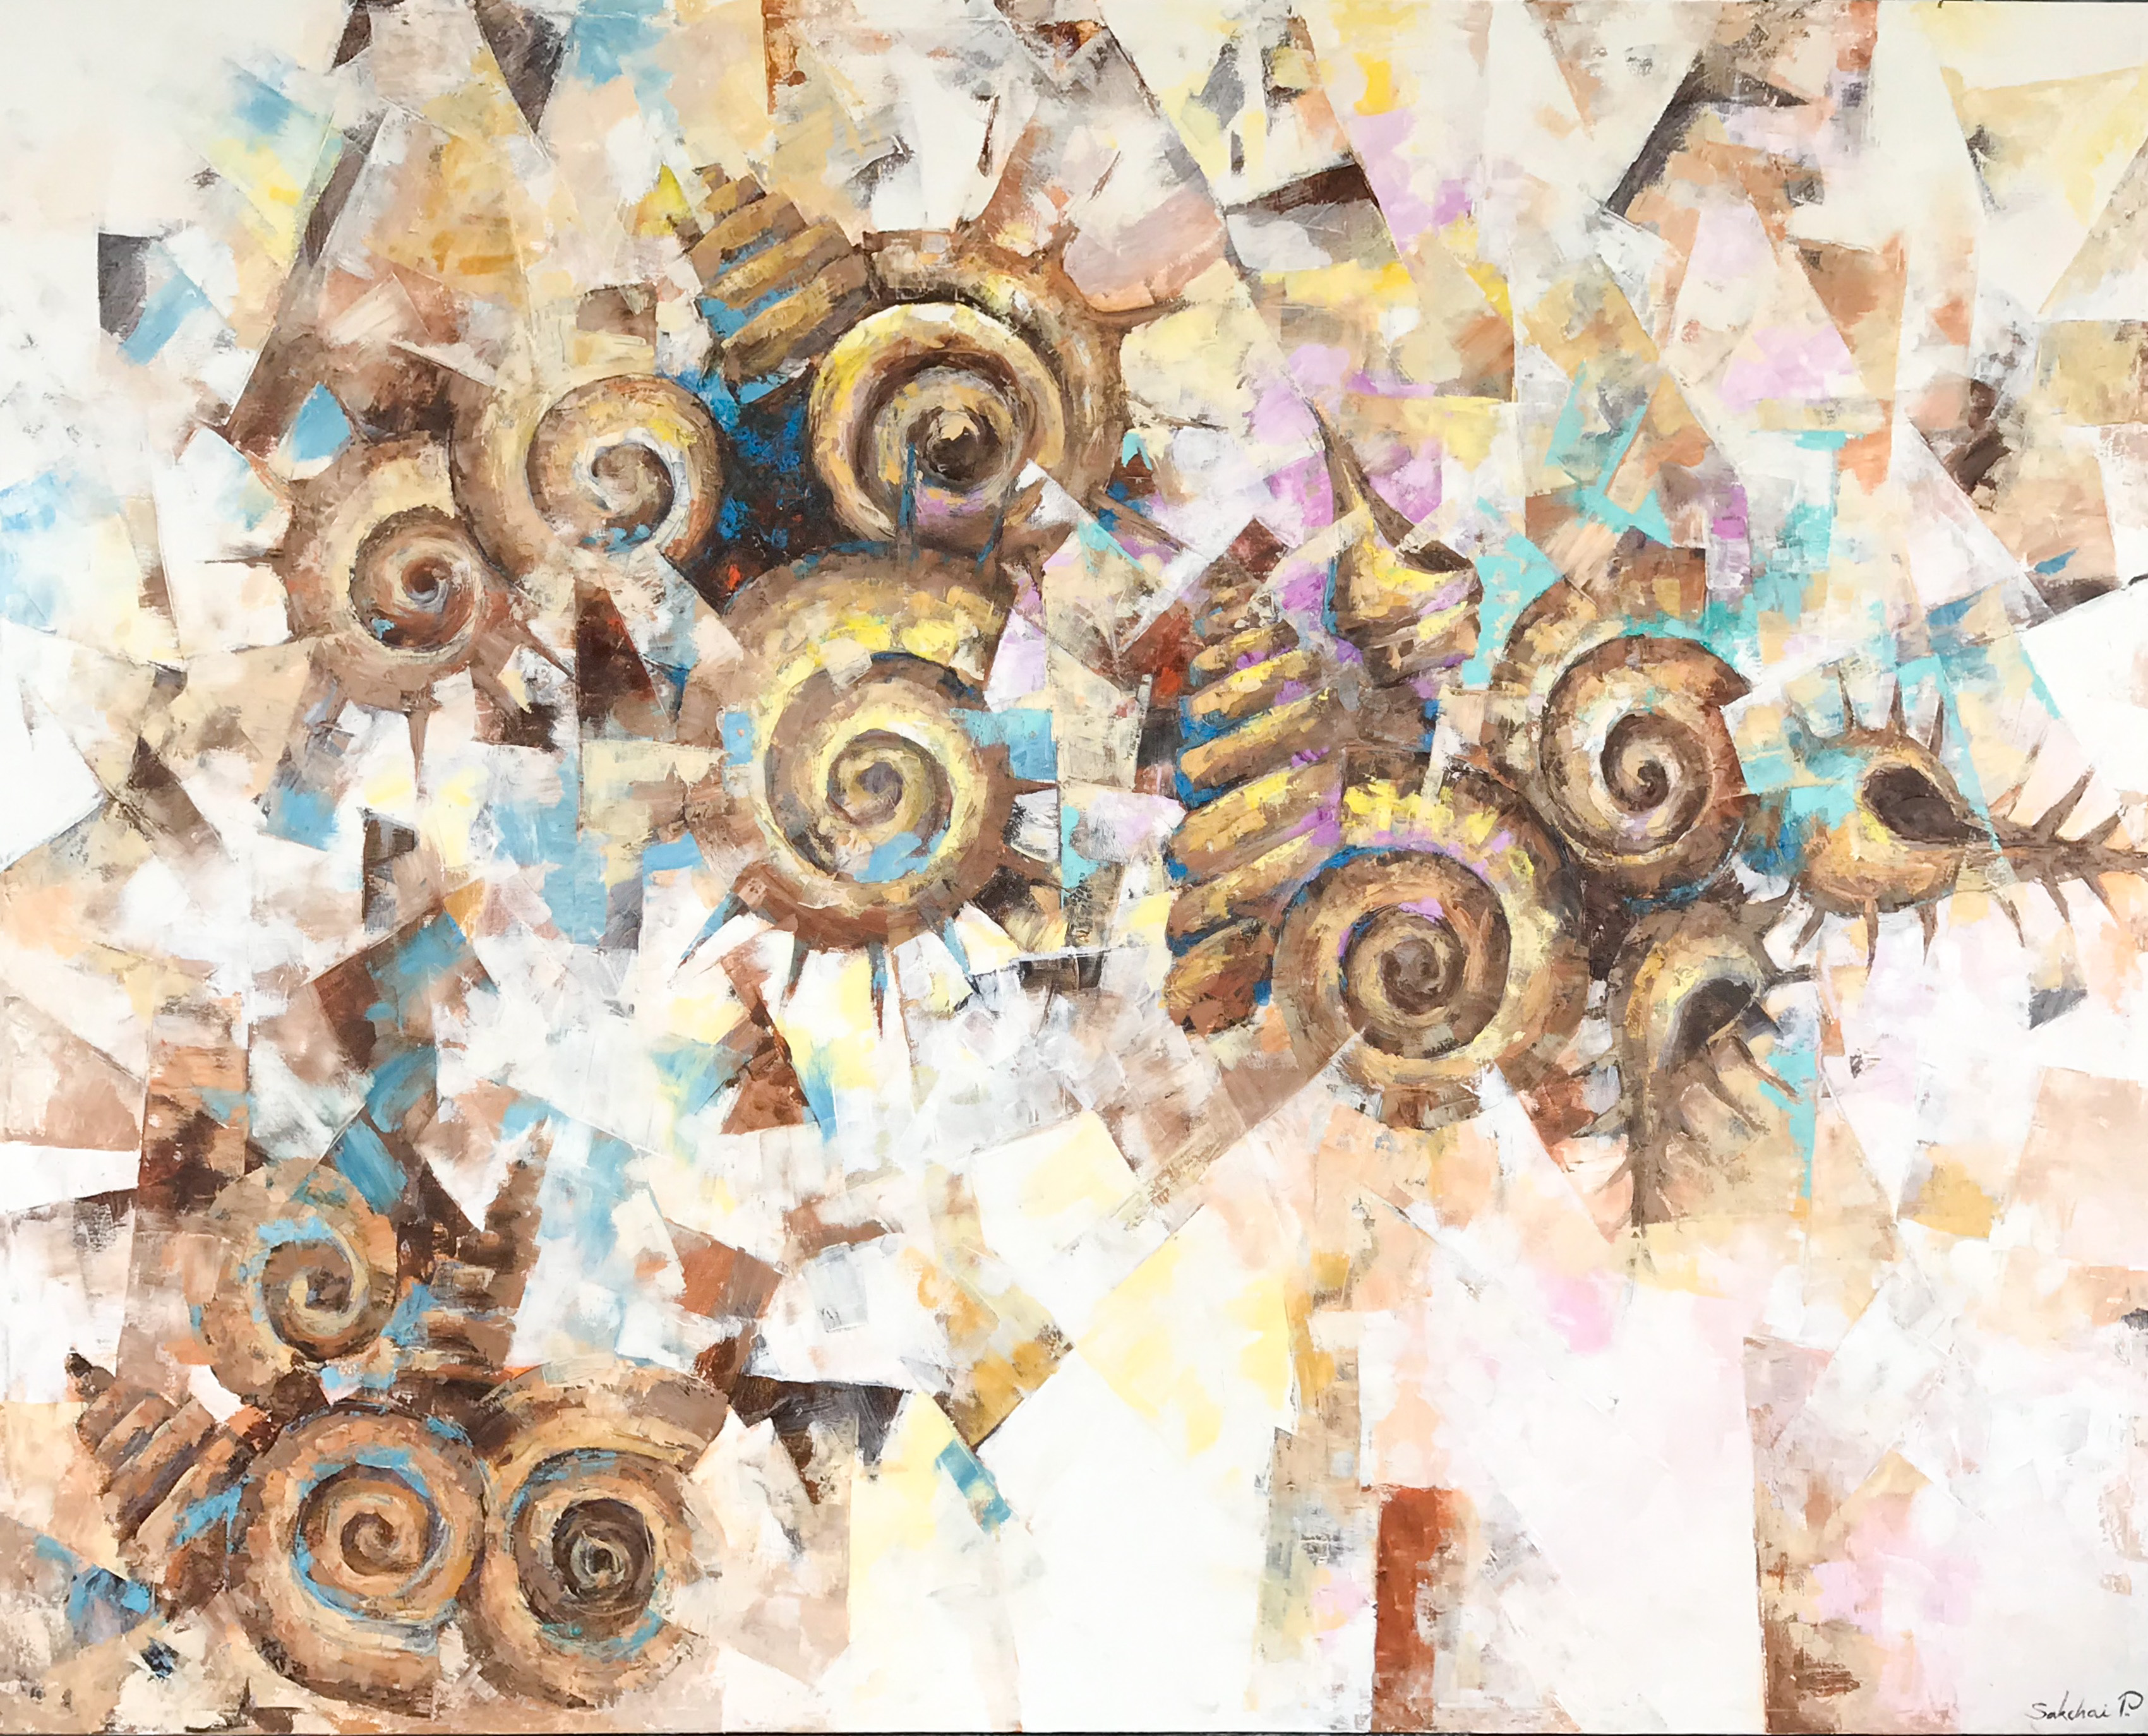 Verity BL 02 artwork by Sakchai Pongsawat - art listed for sale on Artplode